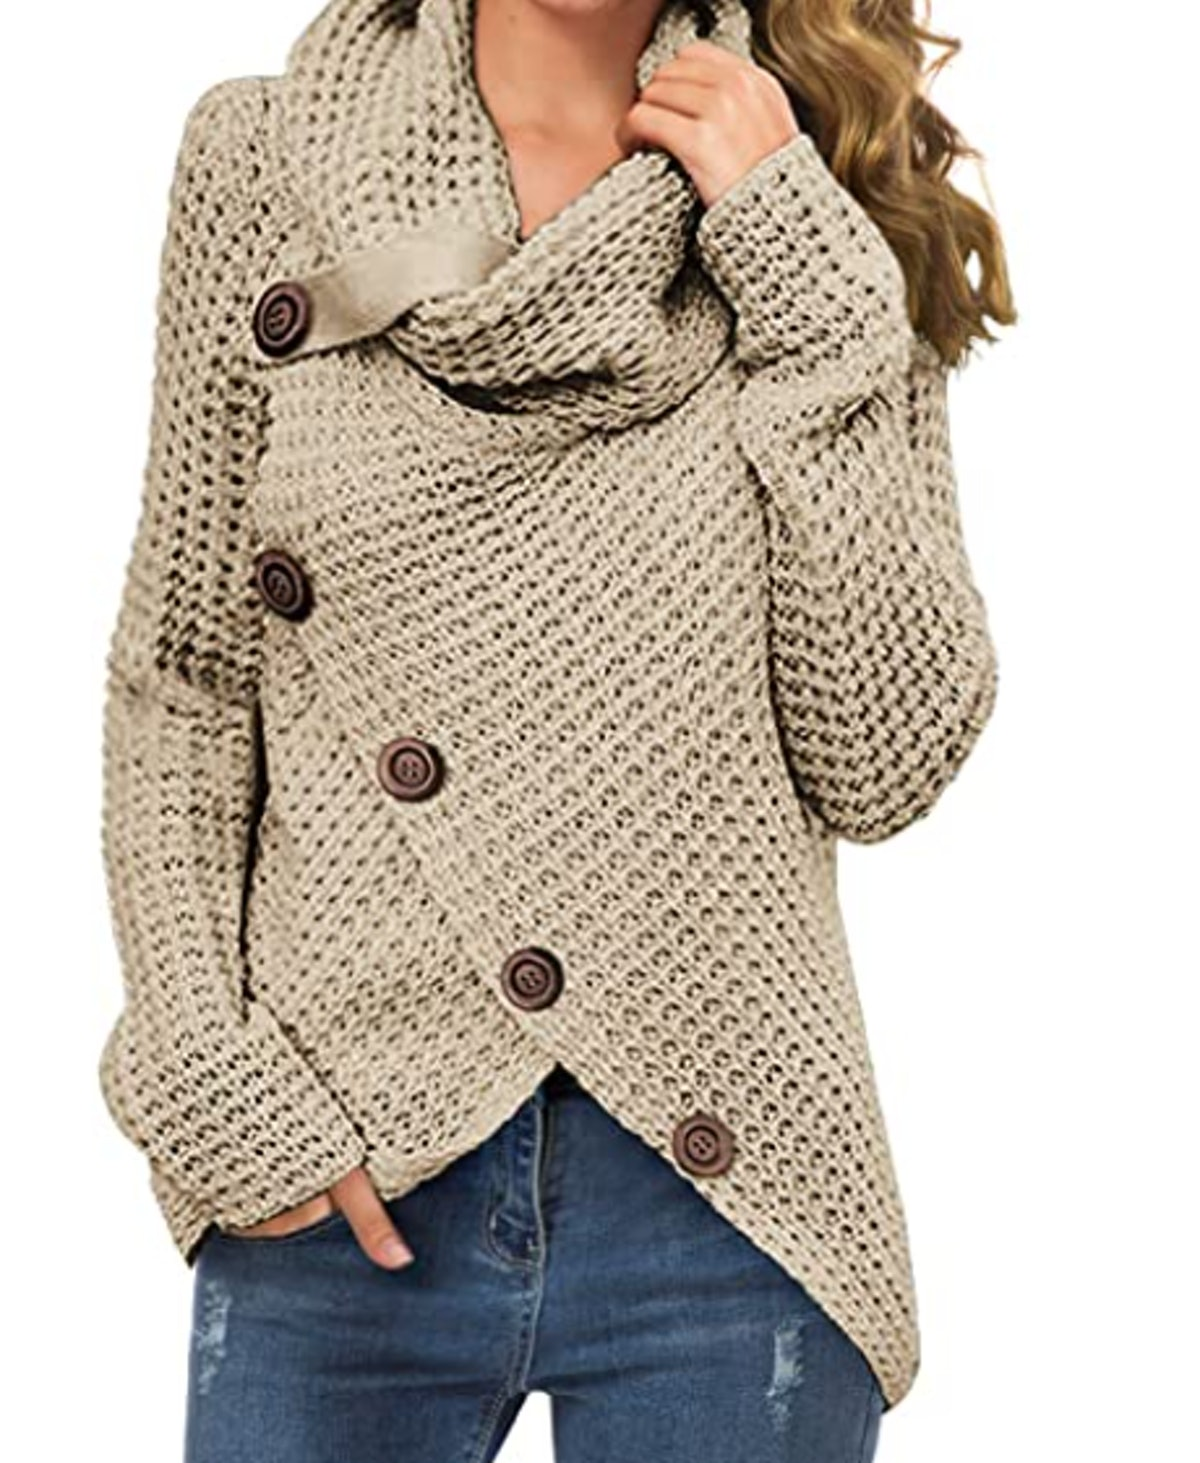 GRECERELLE Women's Cowl Neck Asymmetric Wrap Sweater